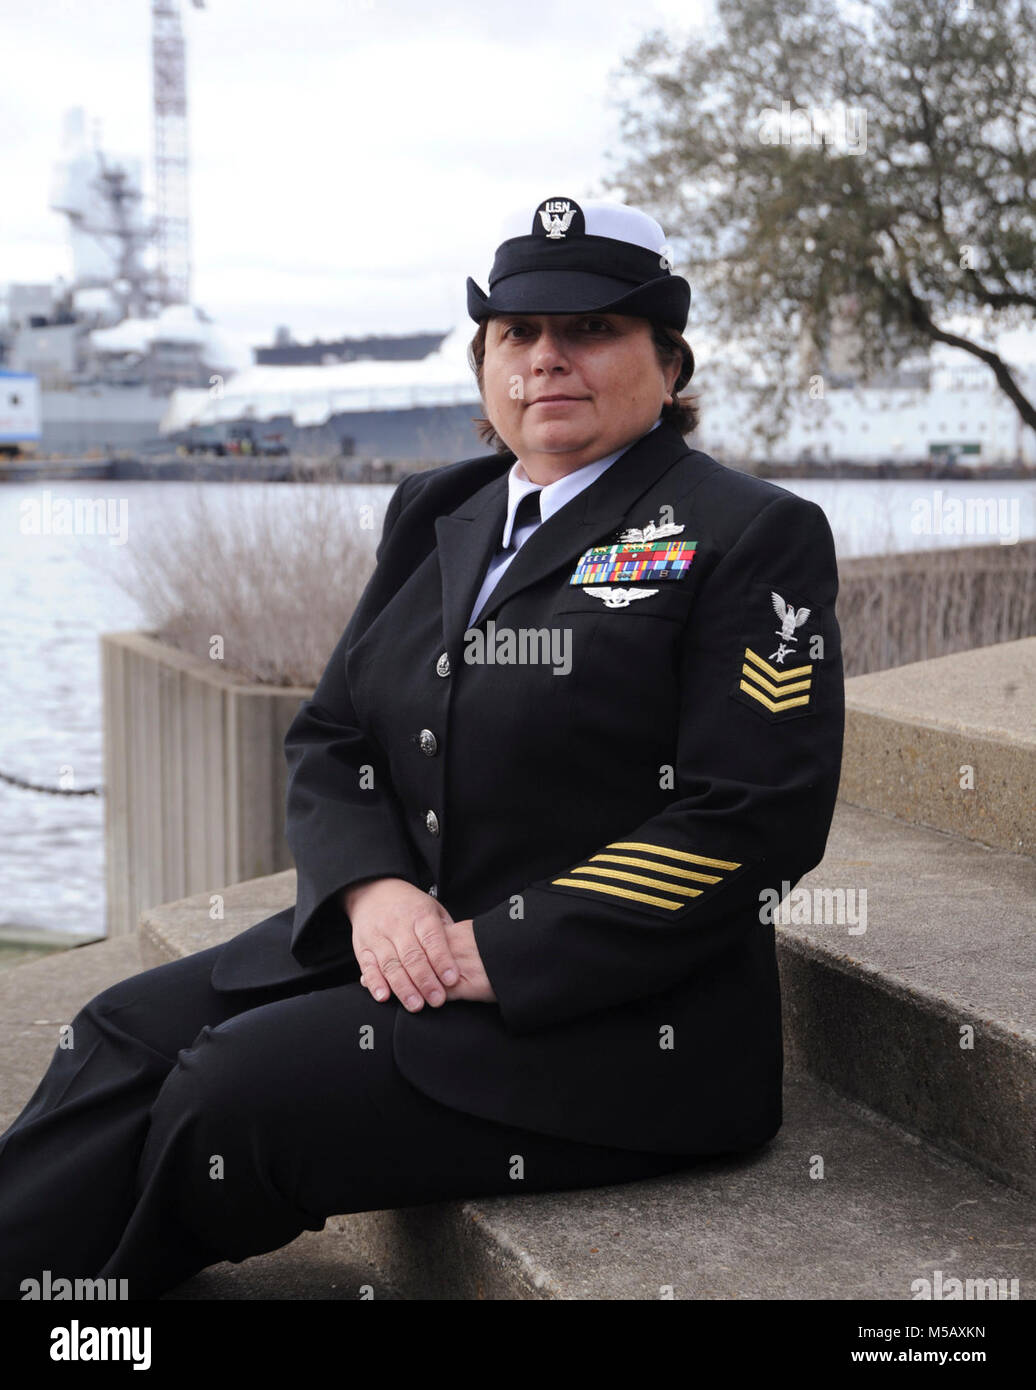 NORFOLK (Feb. 5, 2018) Legalman 1st Class Sherry Hoffman, un nativo de Biloxi, Mississippi, asignado al escuadrón Imagen De Stock